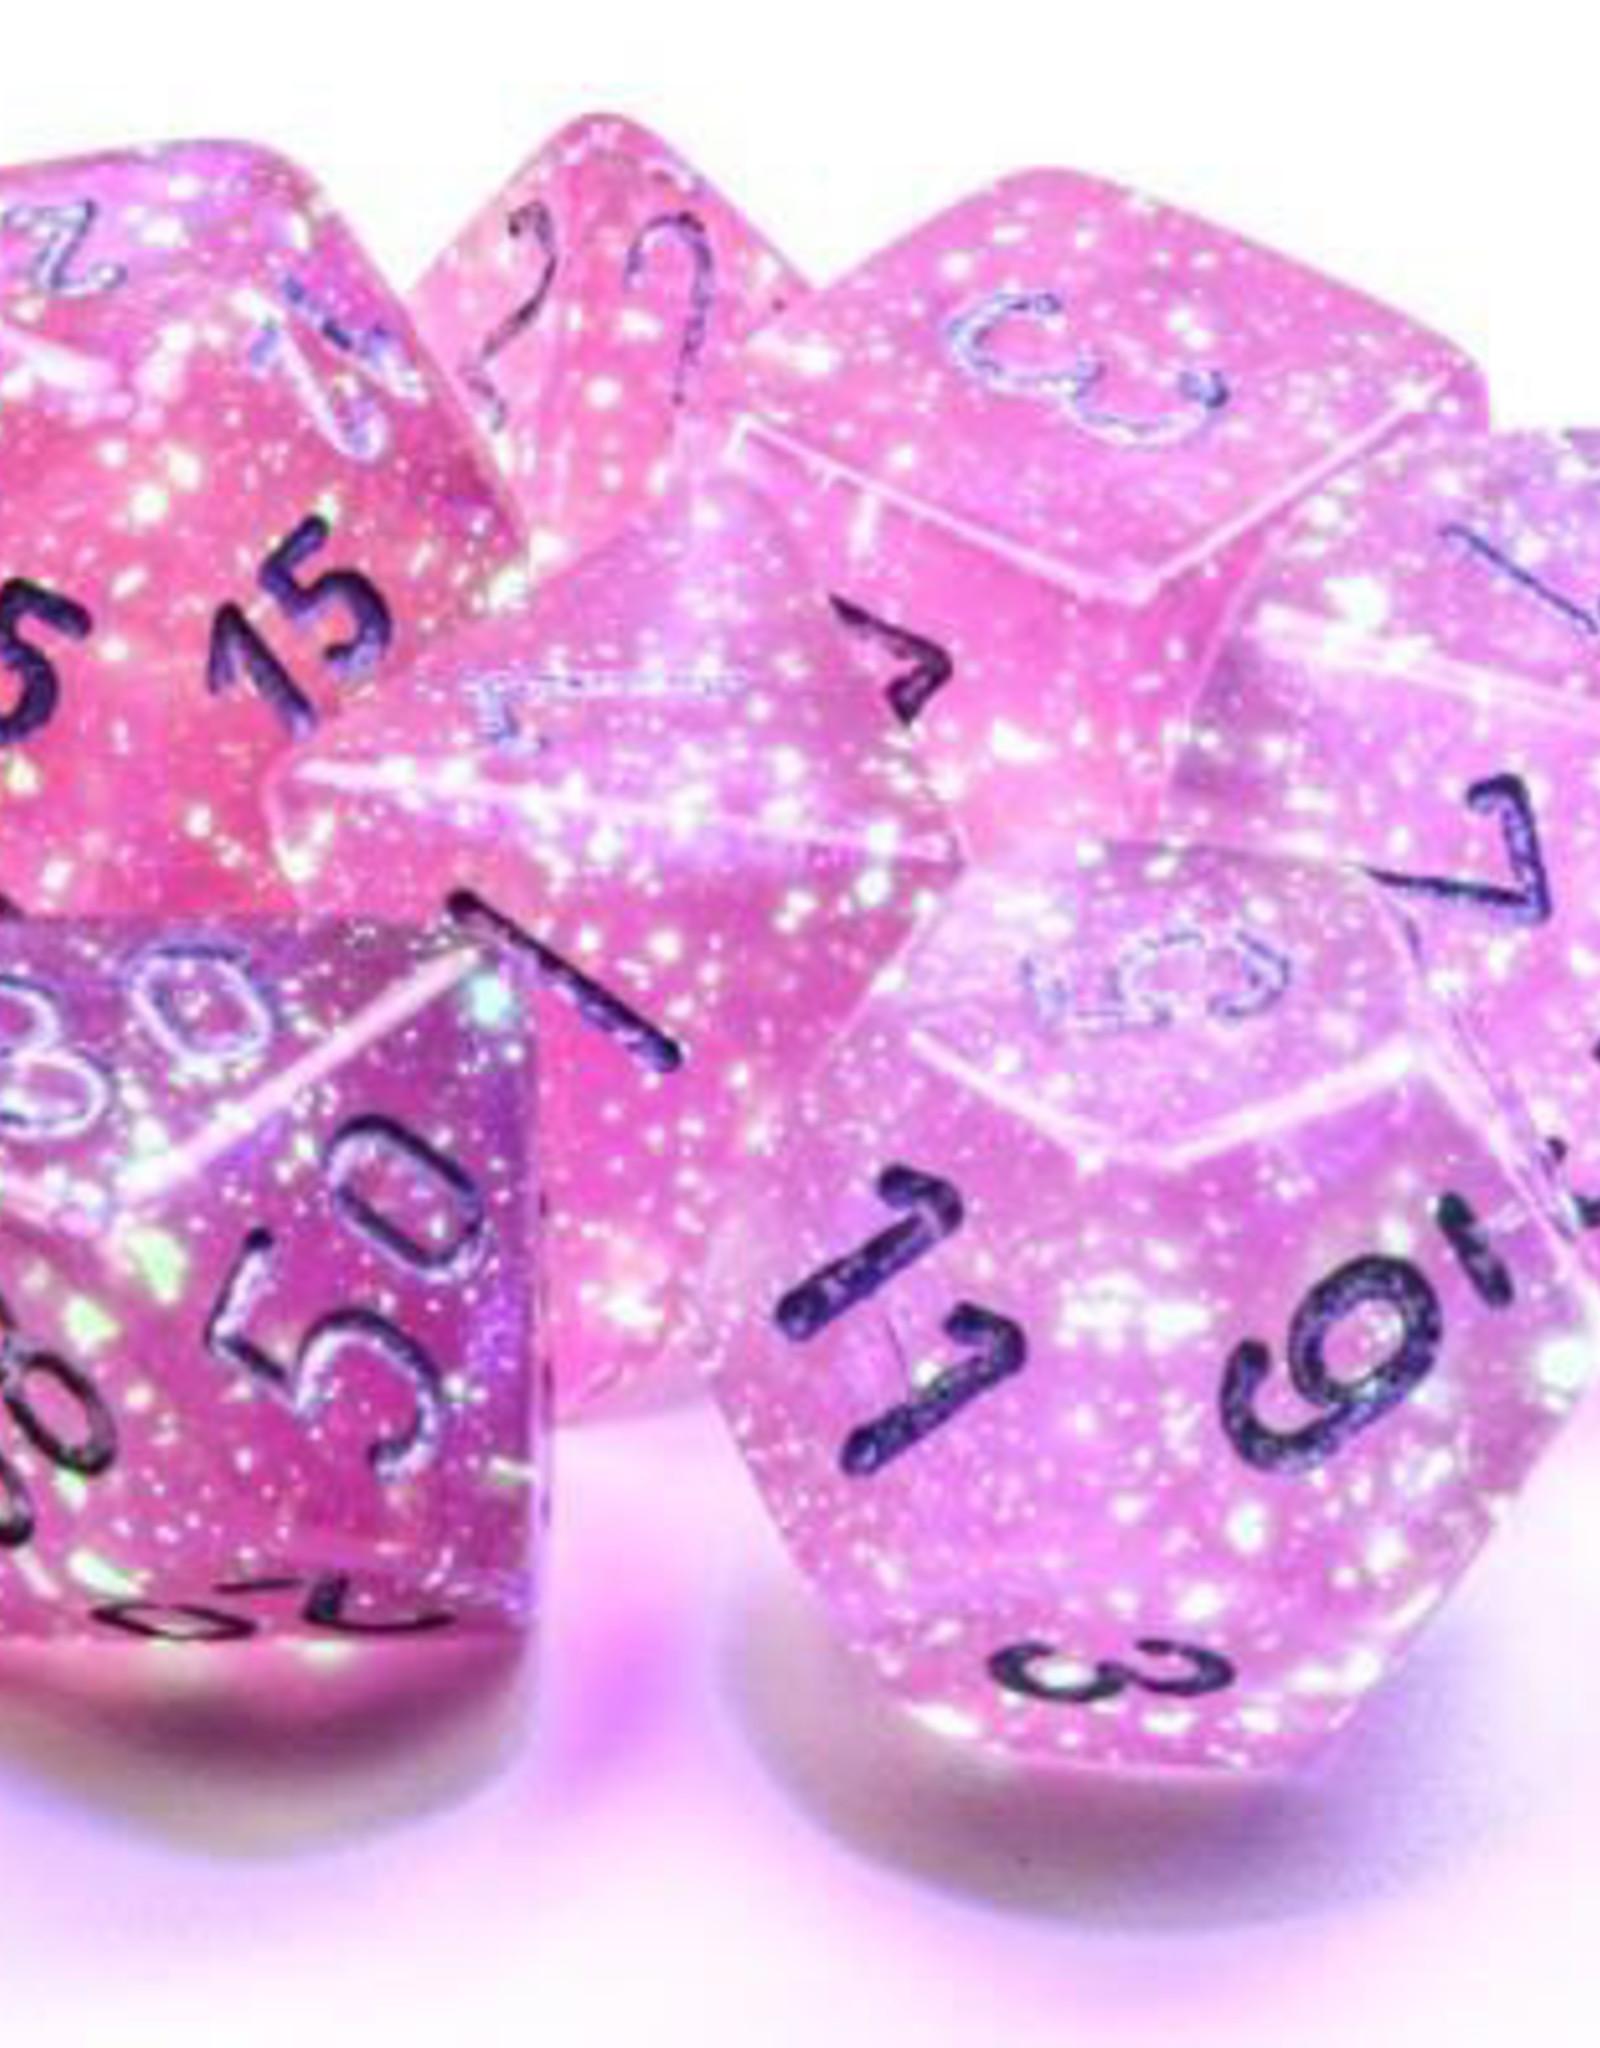 Chessex Chessex 7-Die set Borealis Luminary  - Pink/Silver